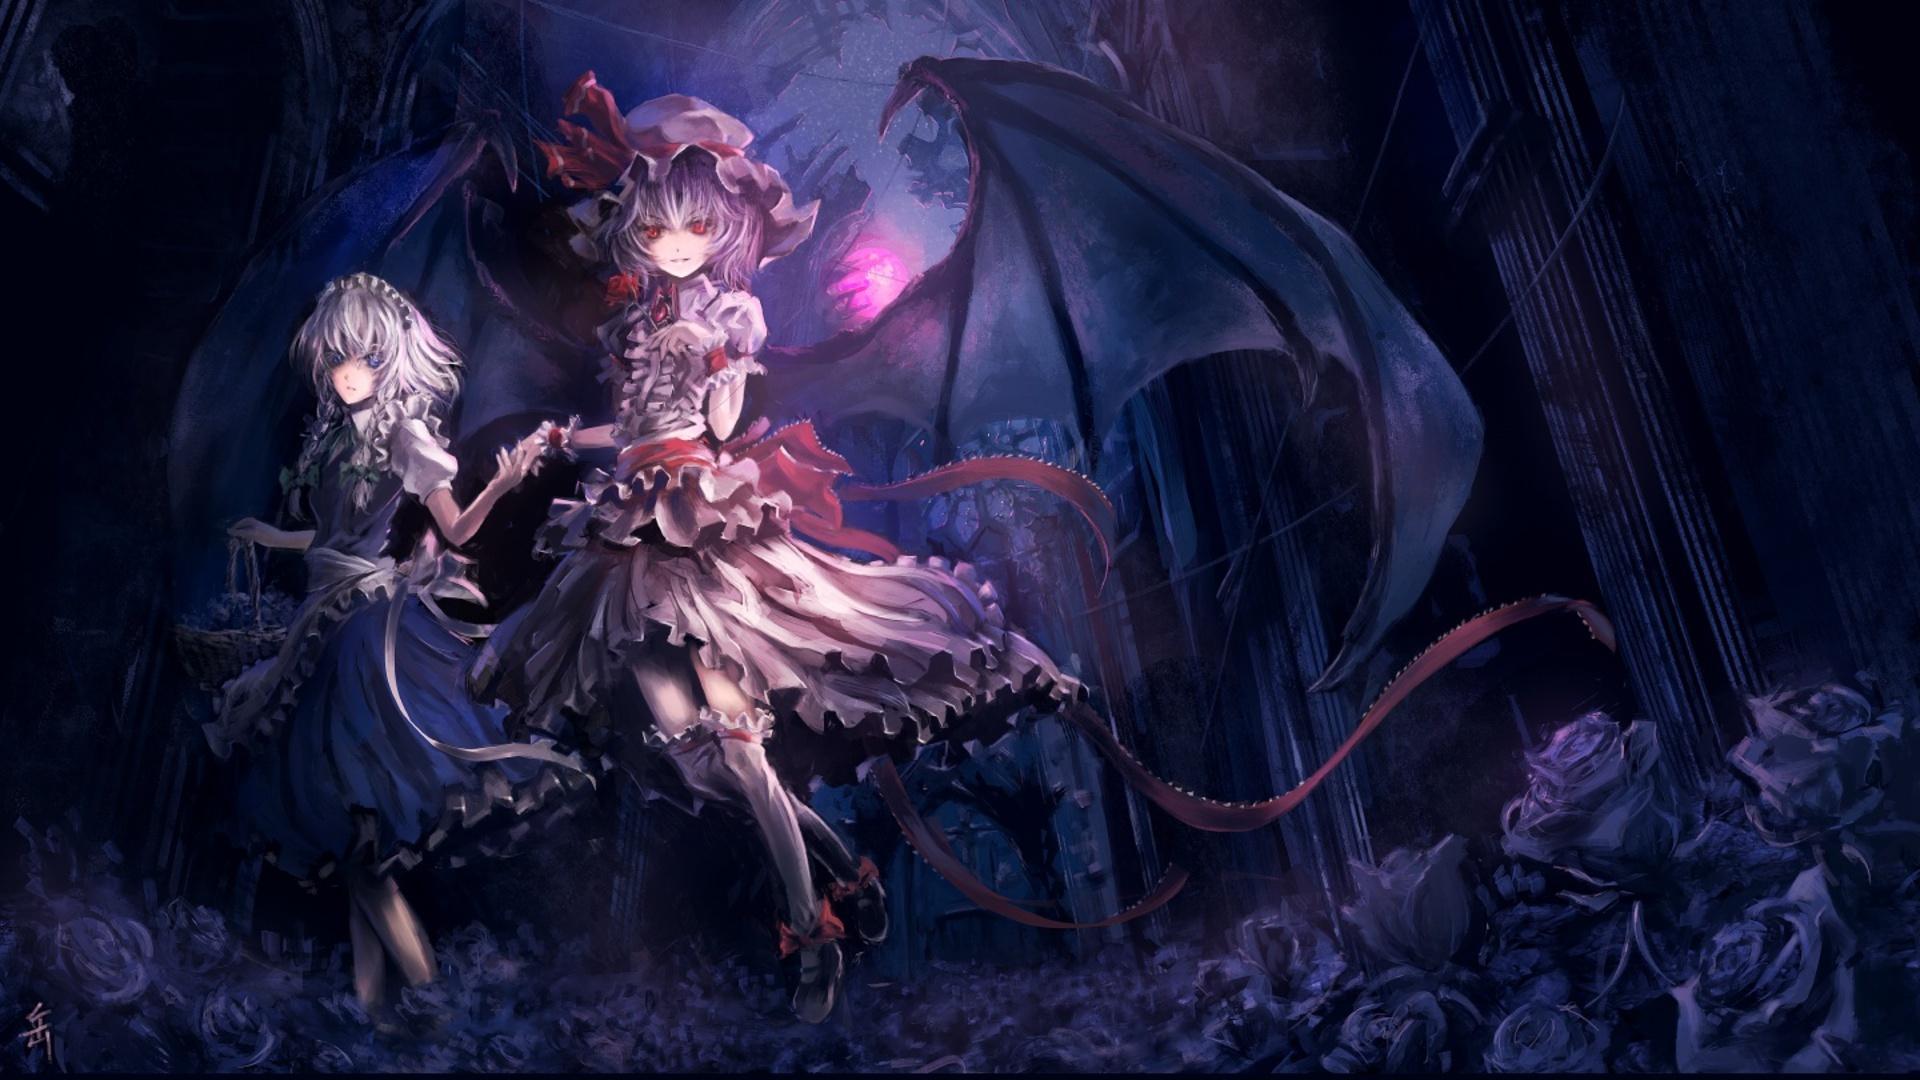 Anime Gothic Girl free photo